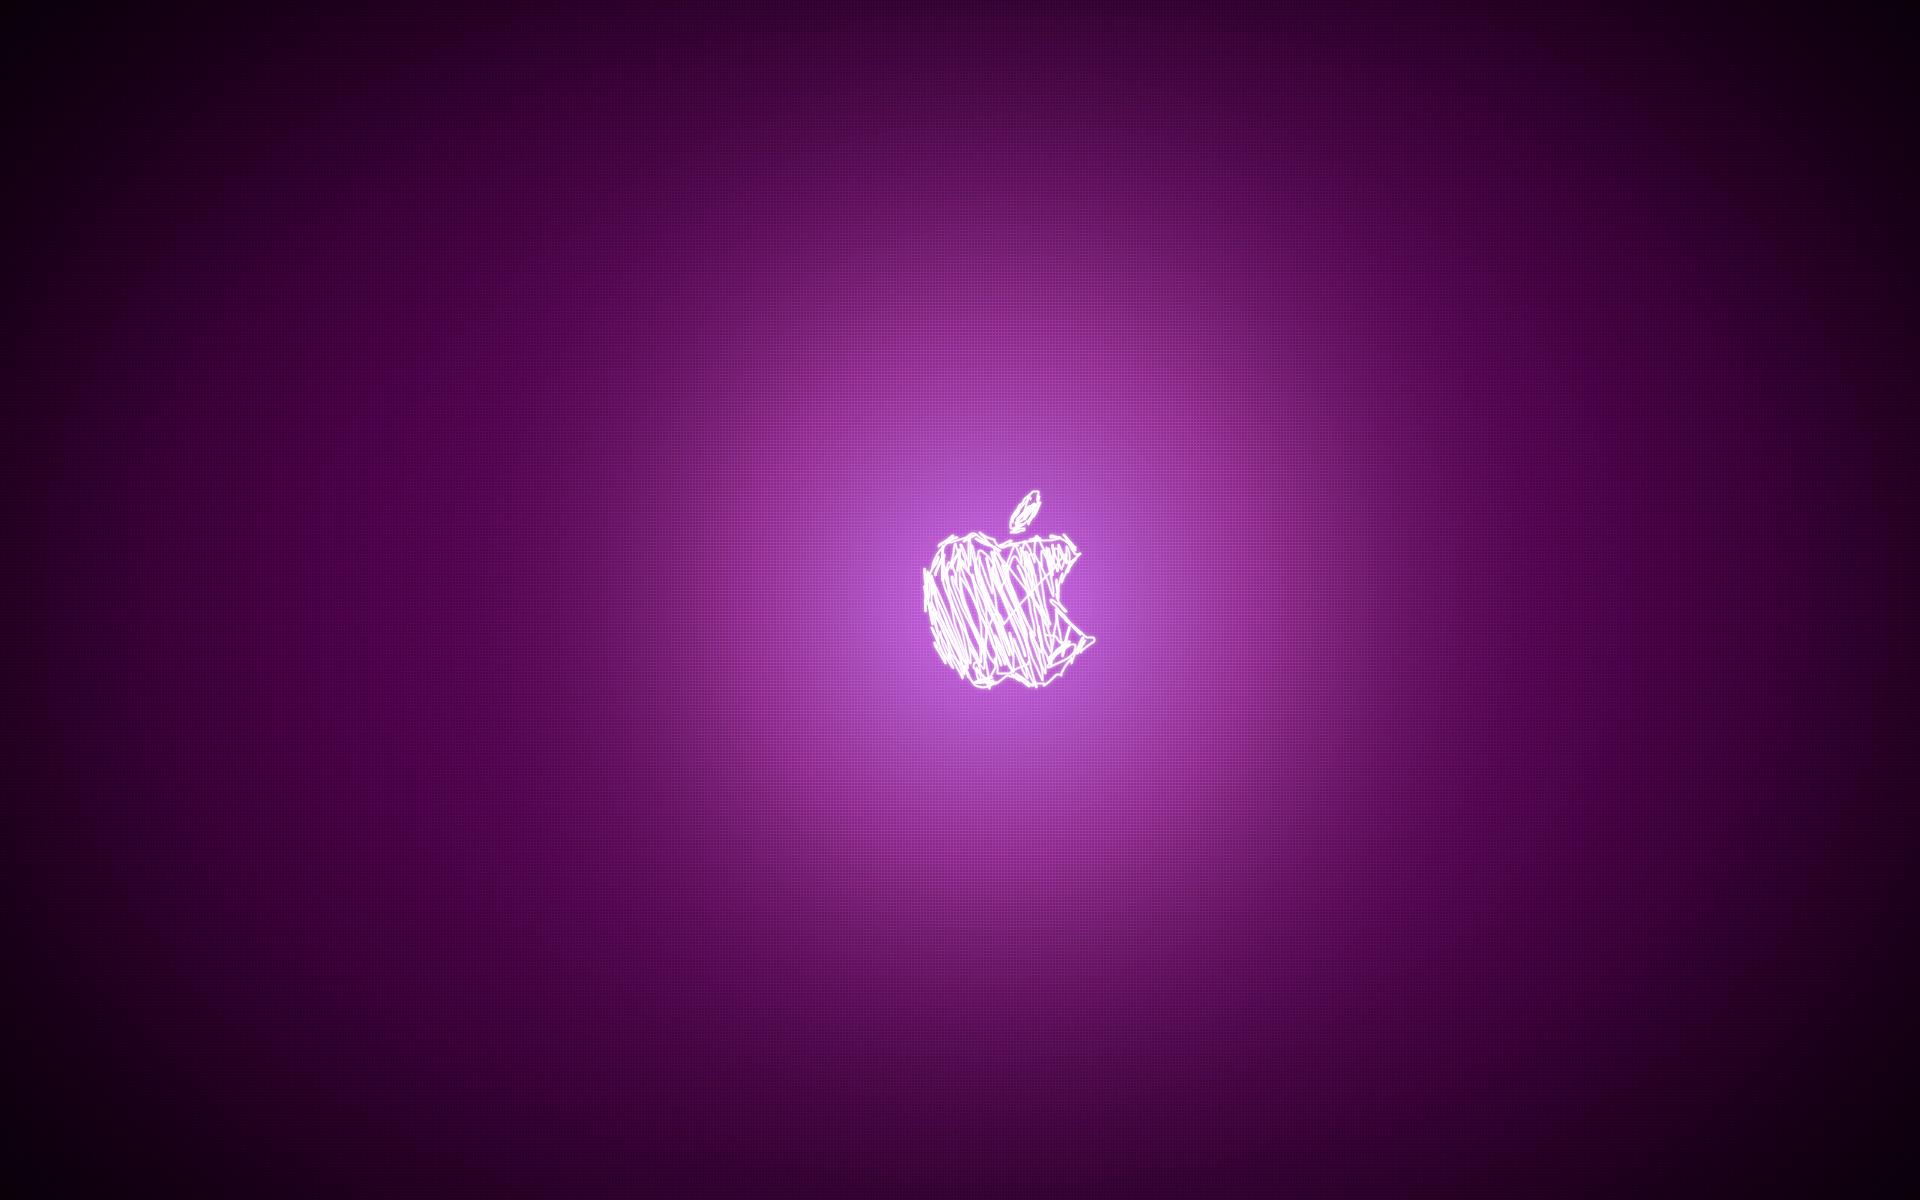 fantastic apple wallpaper 45172